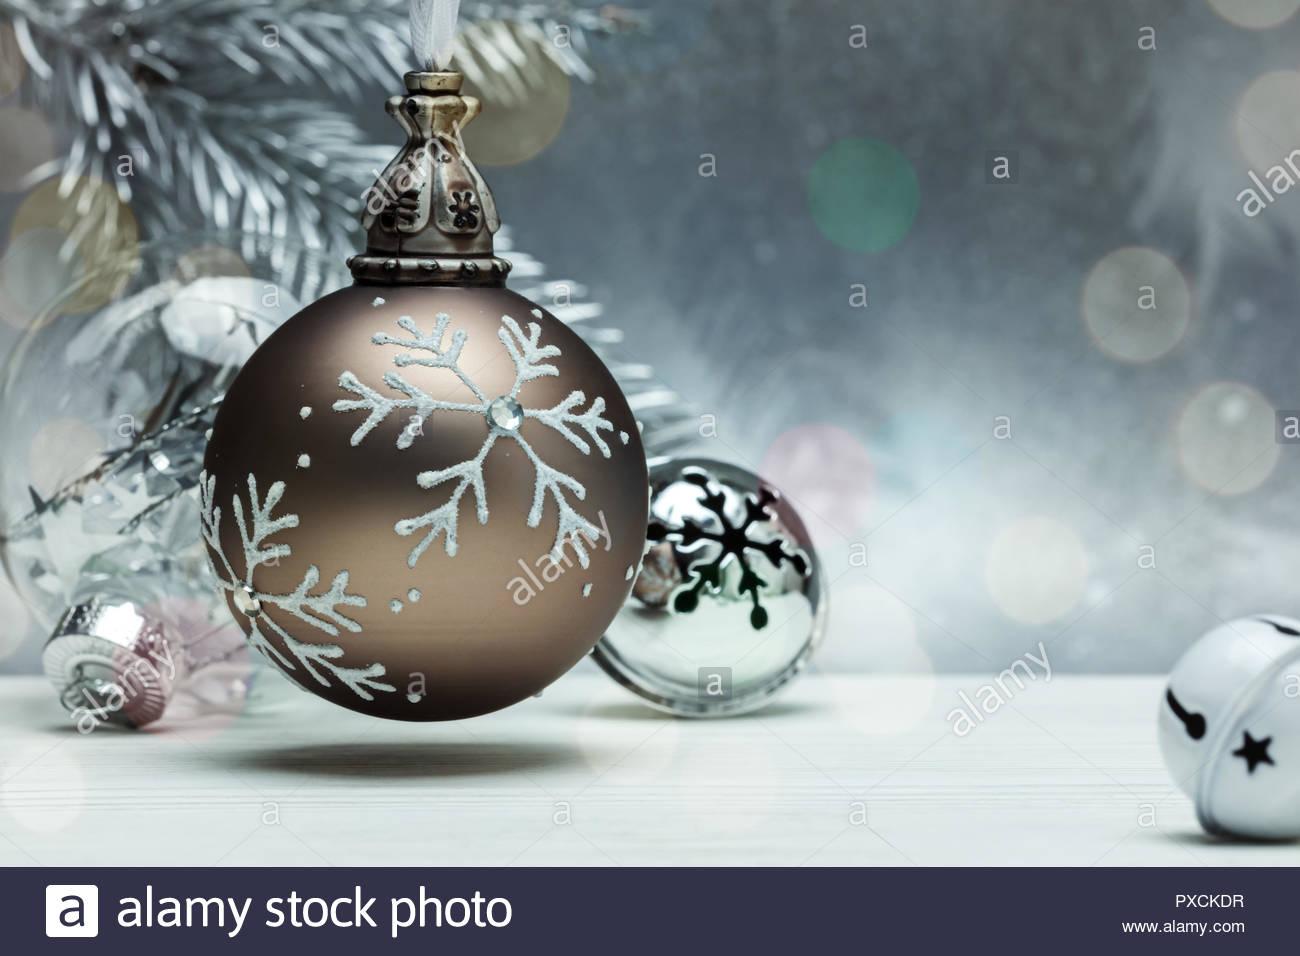 decorative glass balls and jingle bells for christmas tree on grey 1300x956